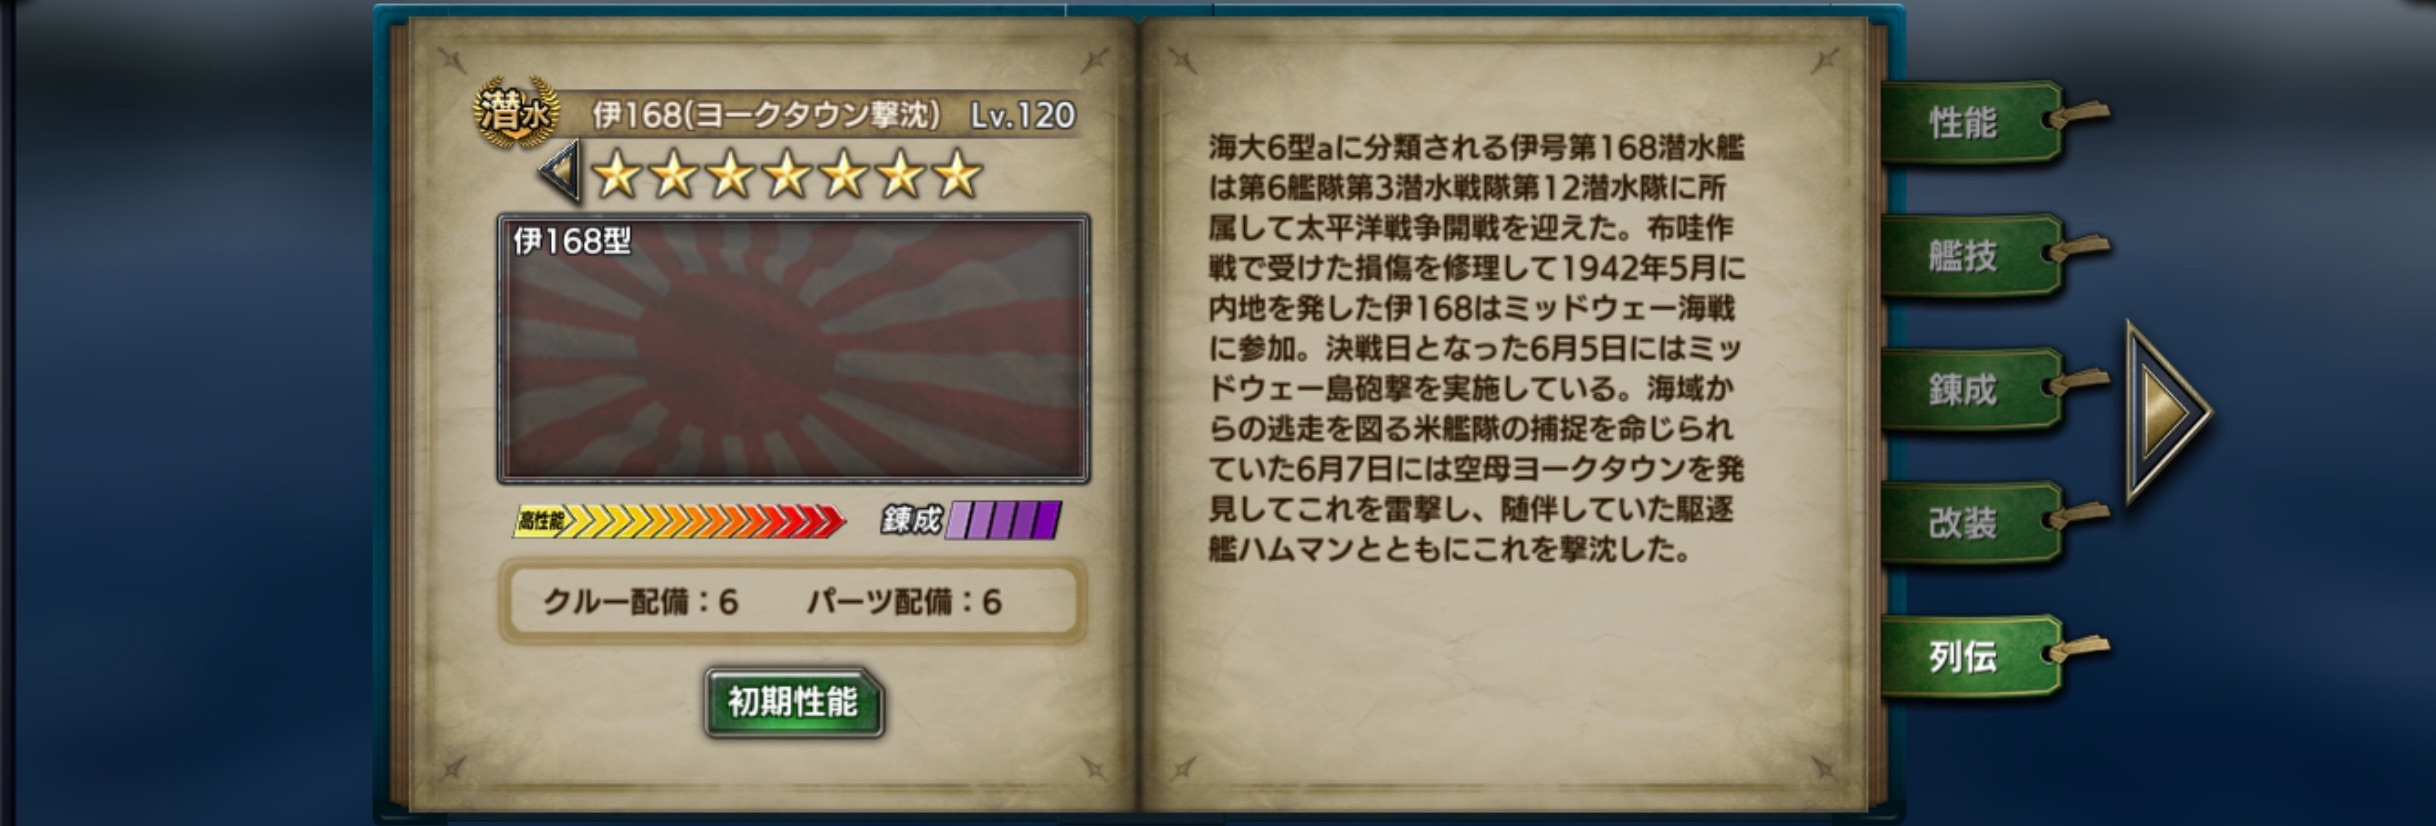 i168Y-history